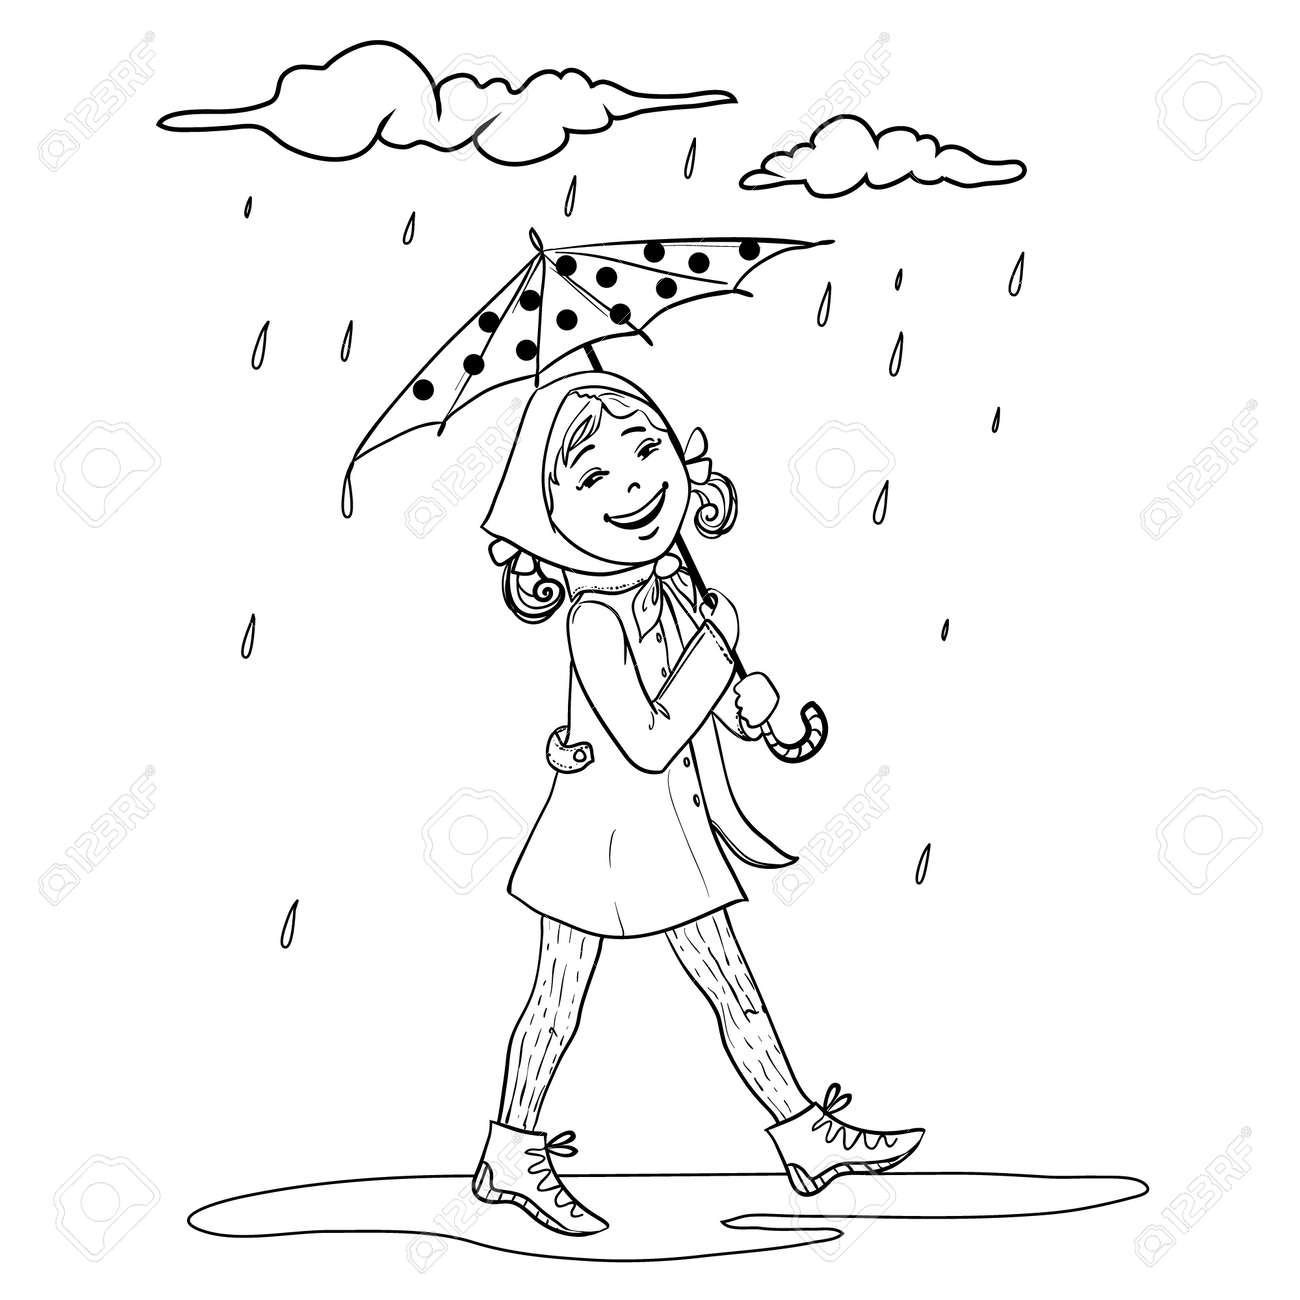 Niña De Dibujos Animados Con Paraguas, En Un Esquema Aislado En ...